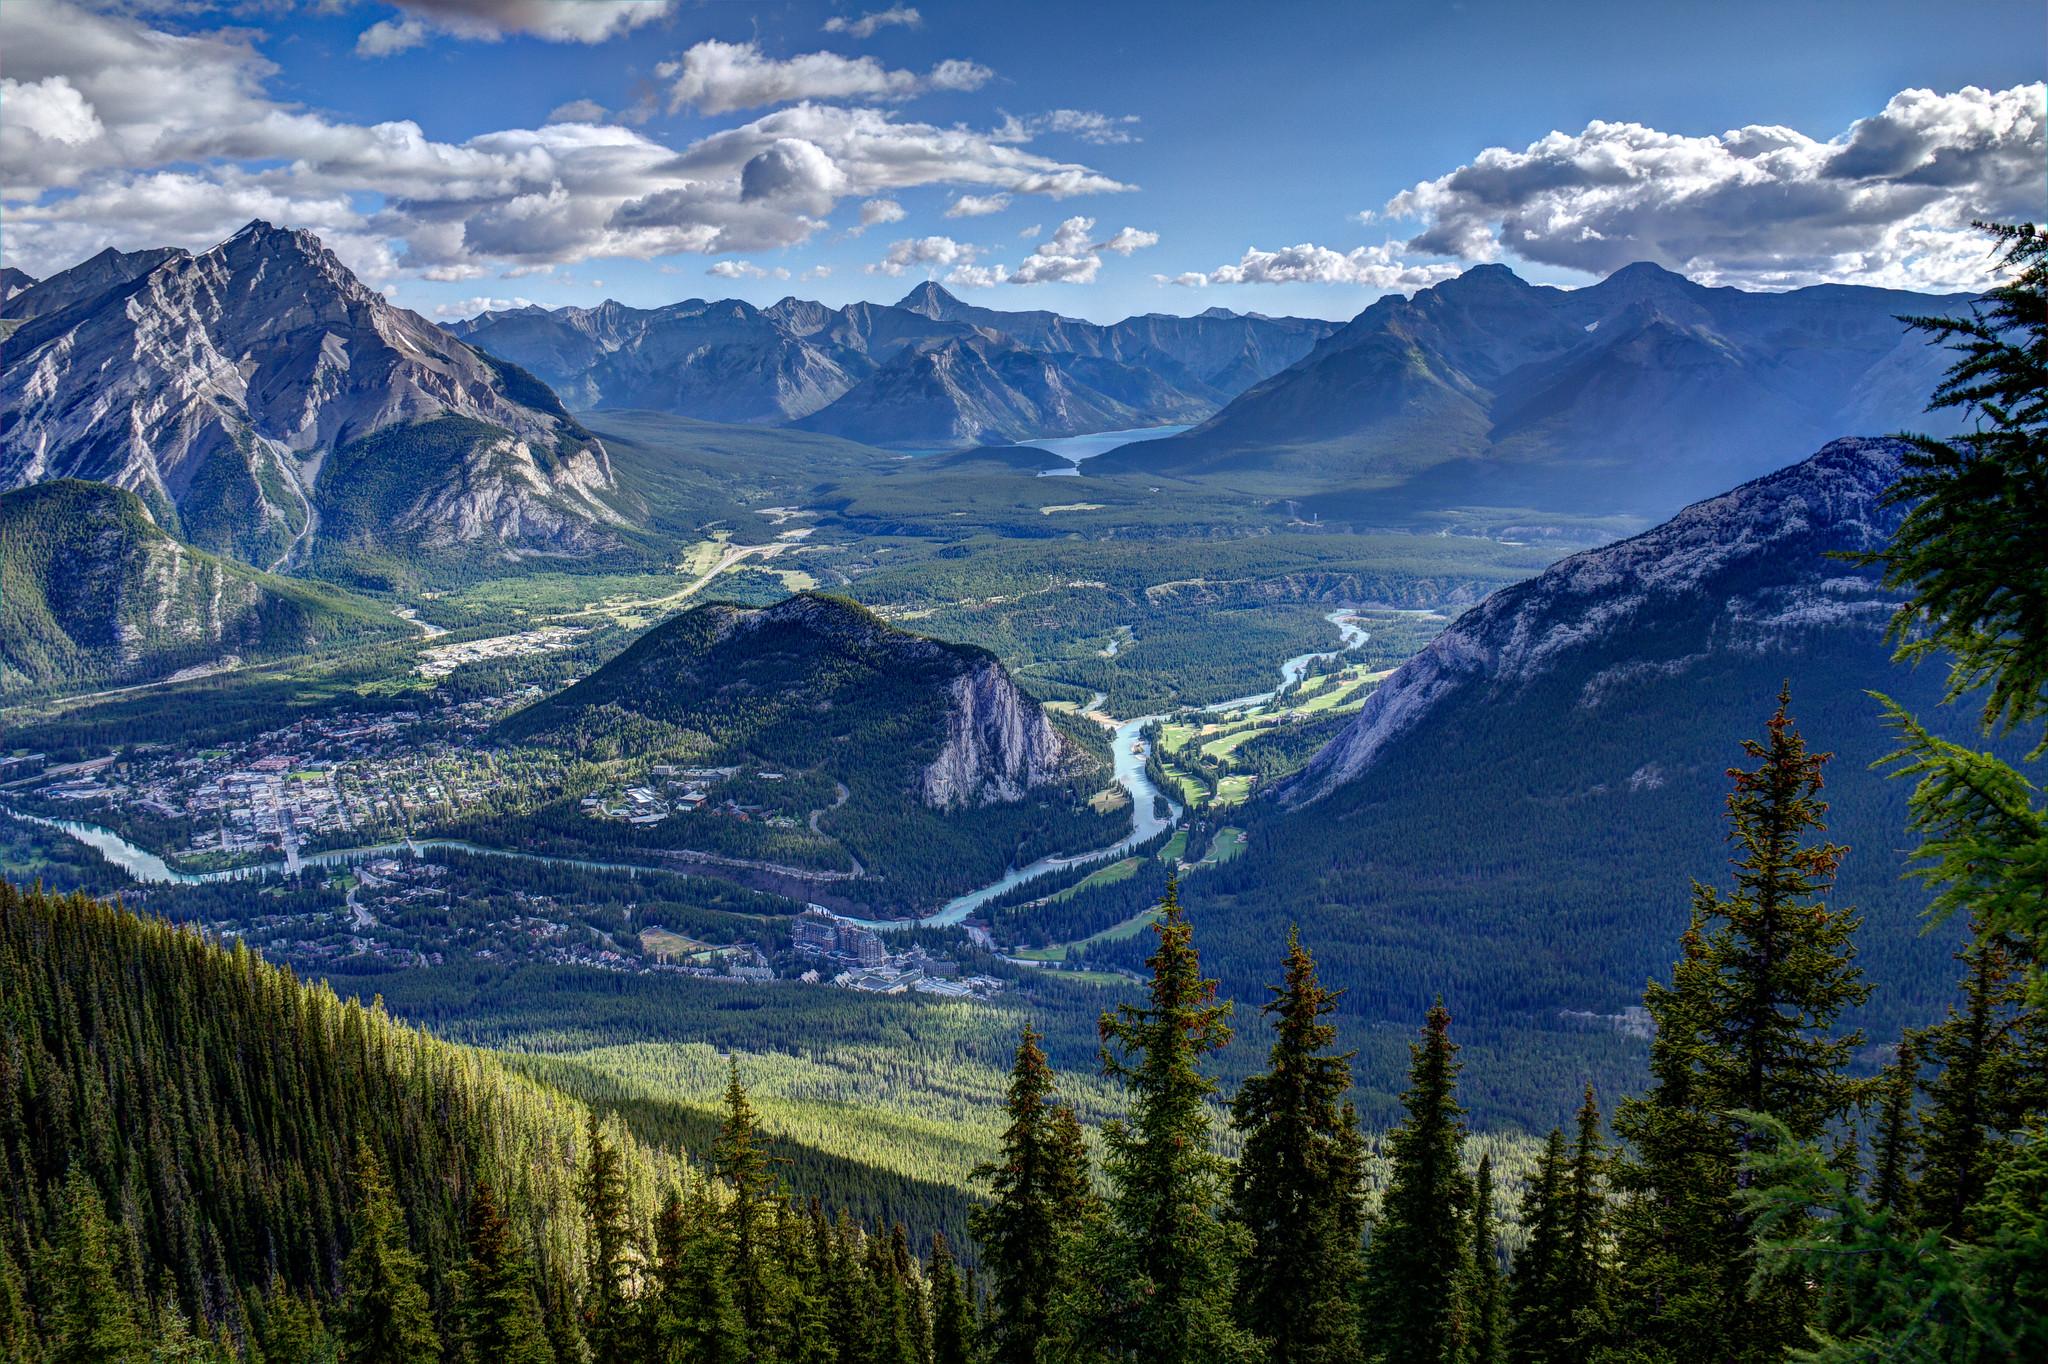 Vancouver Banff Jasper Tour